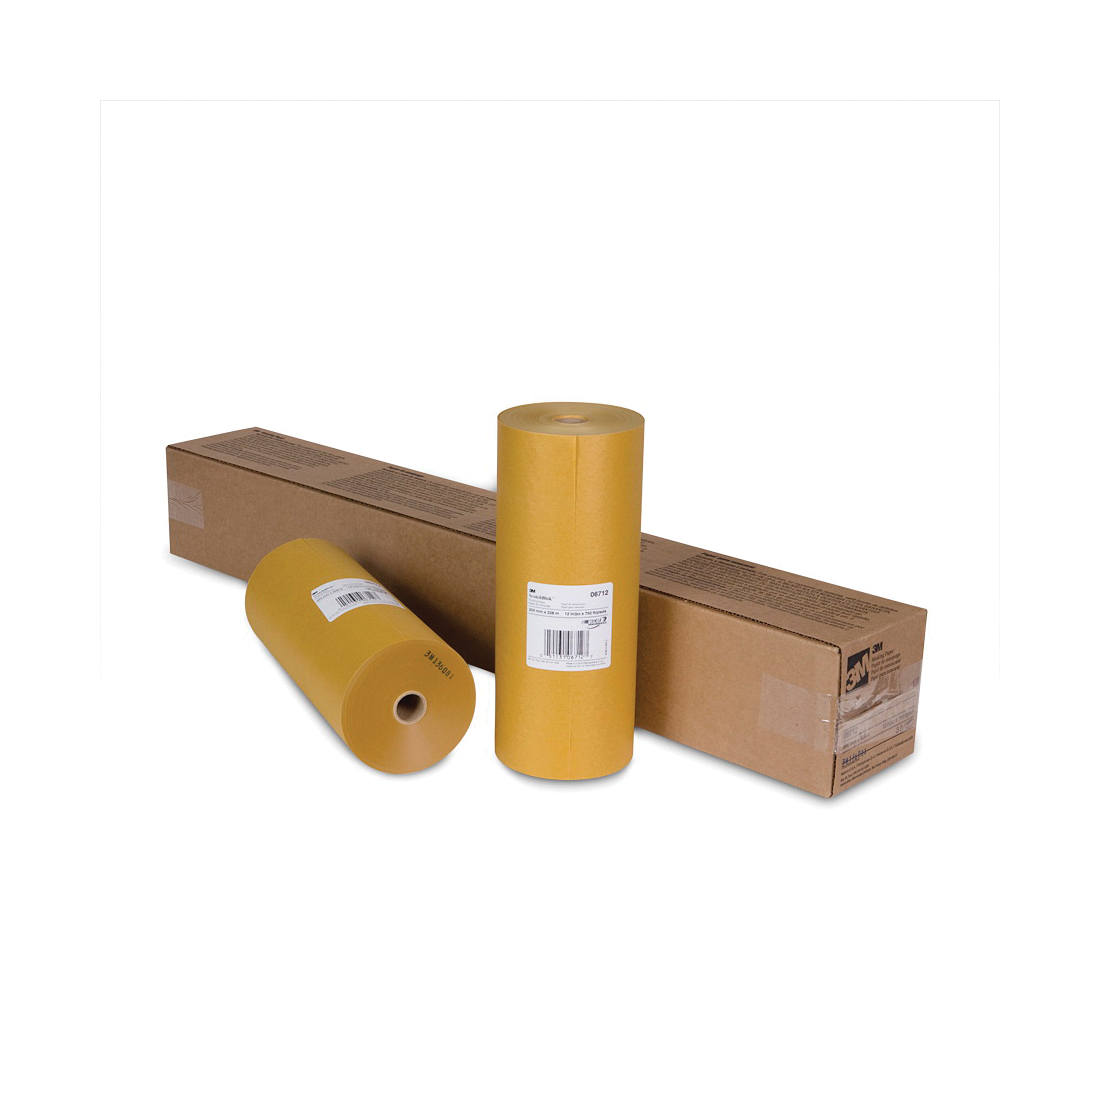 3M™ Scotchblok™ 051131-06712 Masking Paper, 750 ft Roll L x 12 in W x 2 mil THK, Paper, Gold